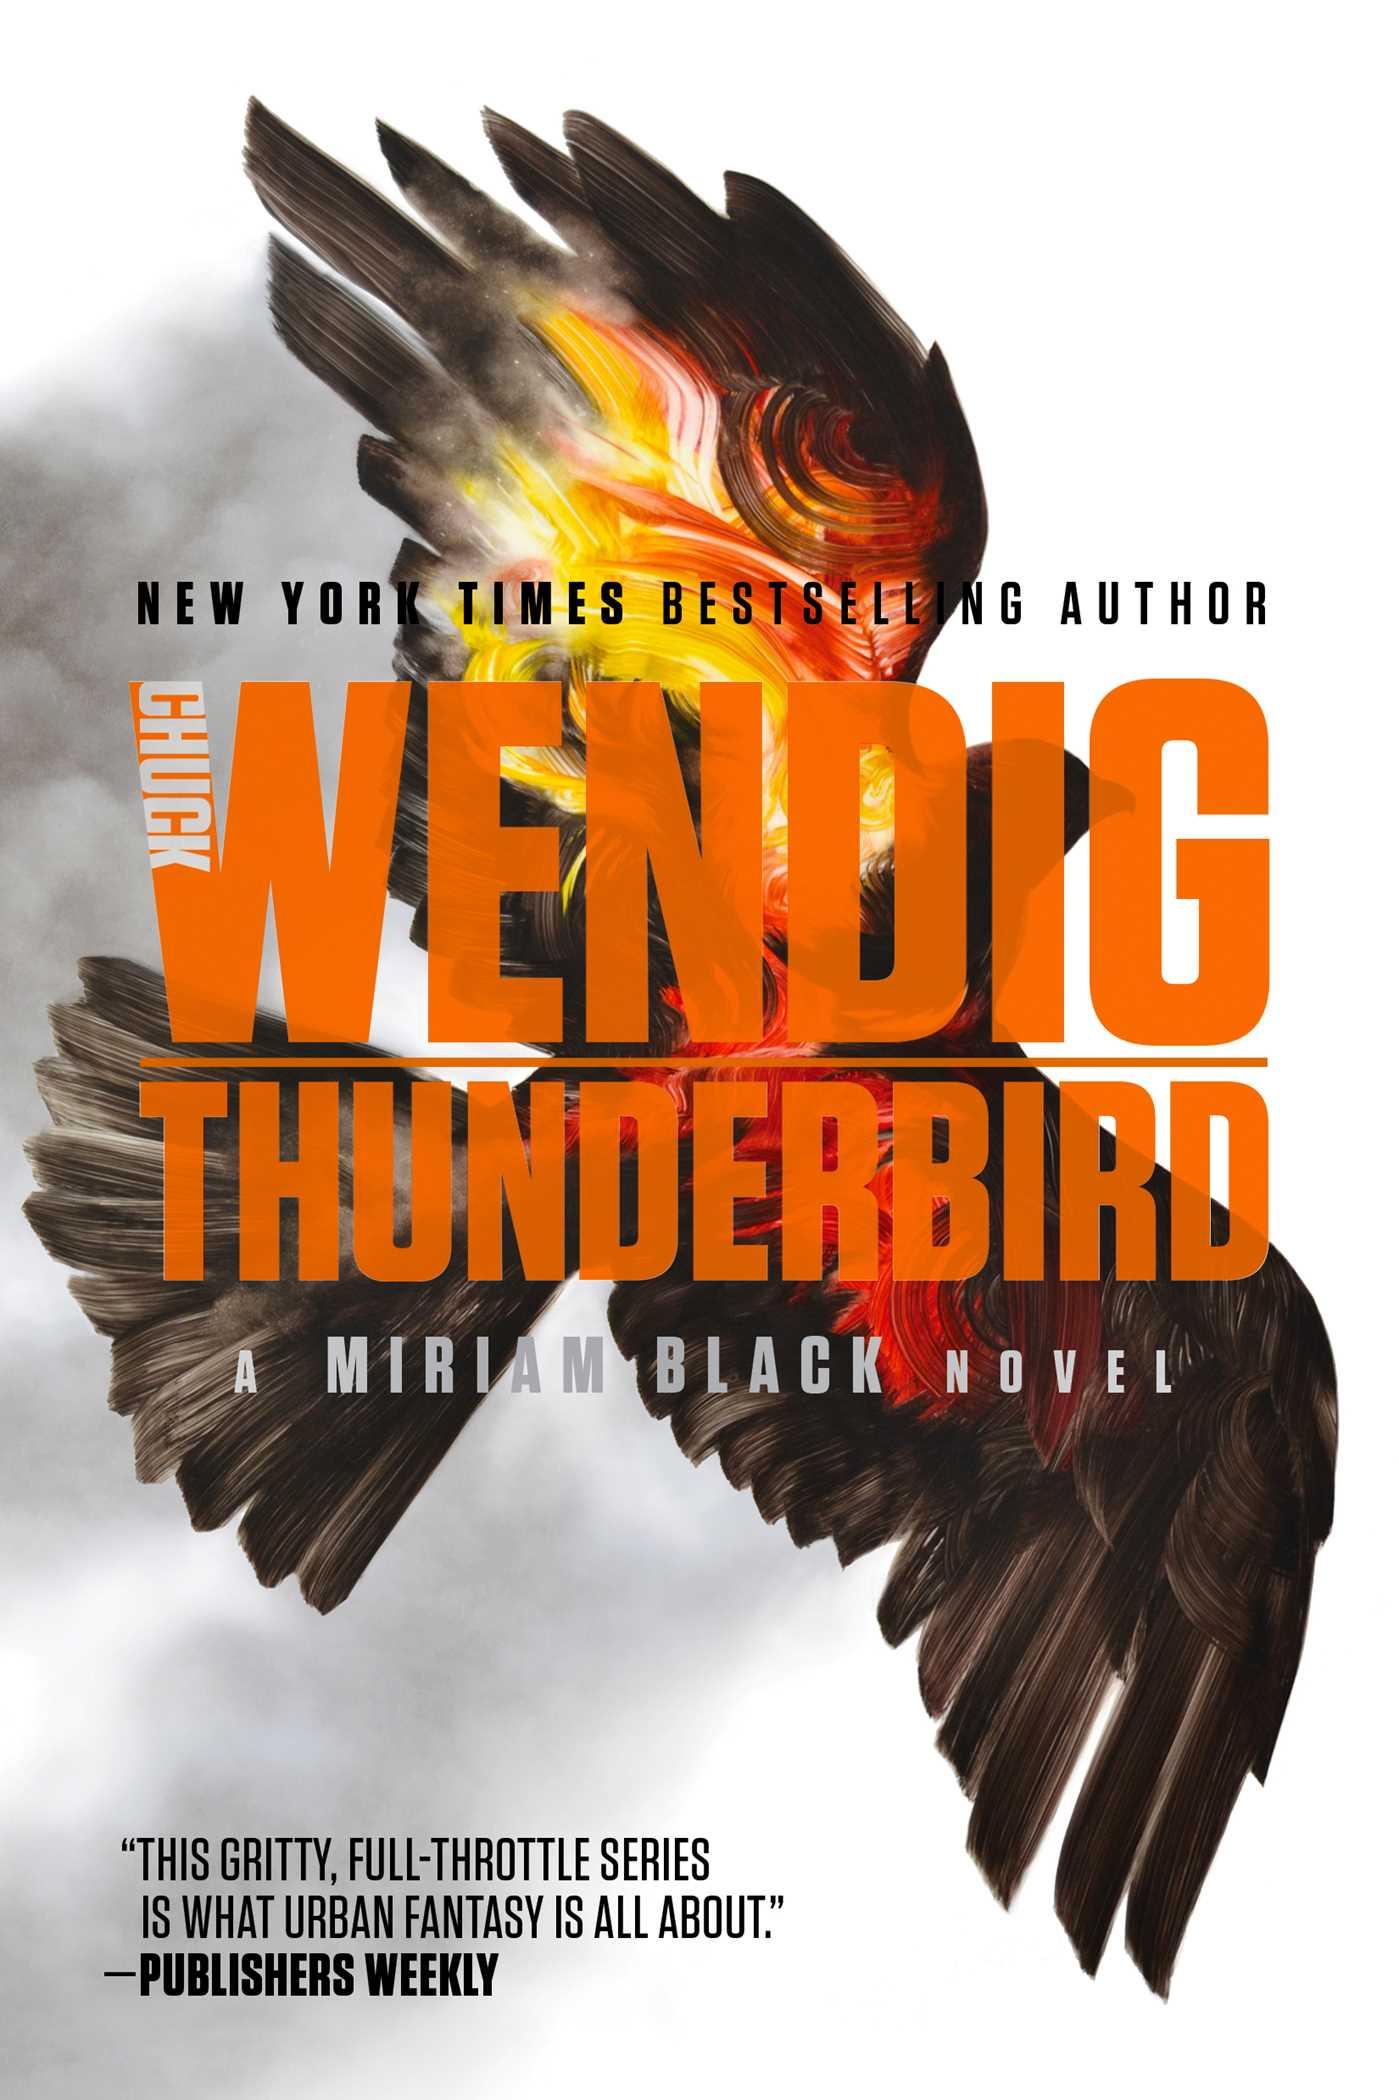 Thunderbird 9781481448727 hr